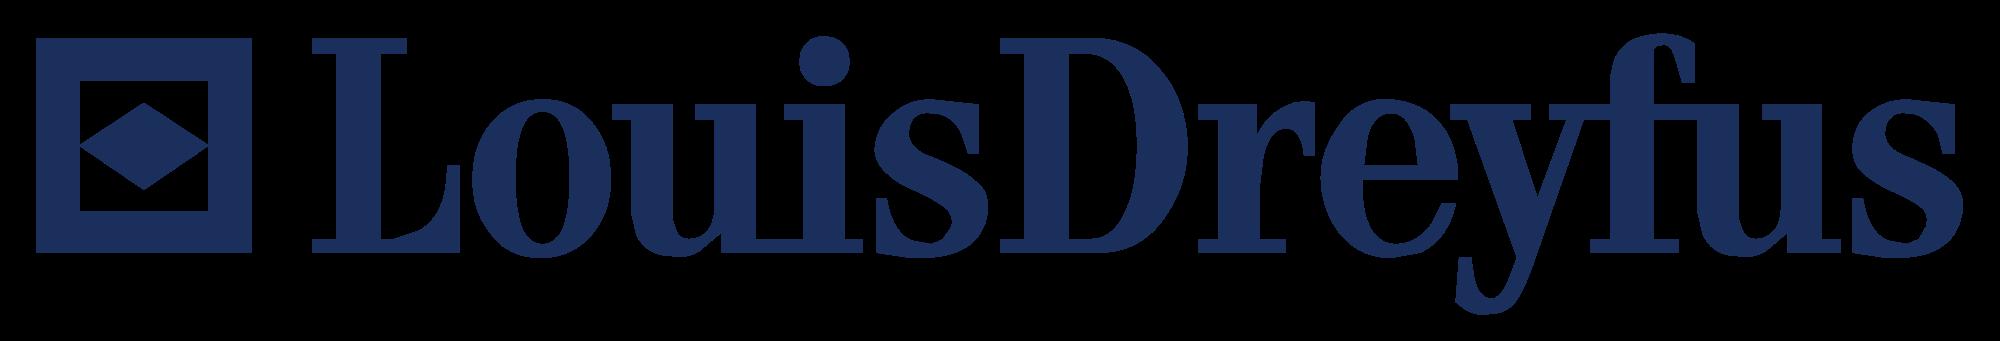 logo-louis-dreyfus